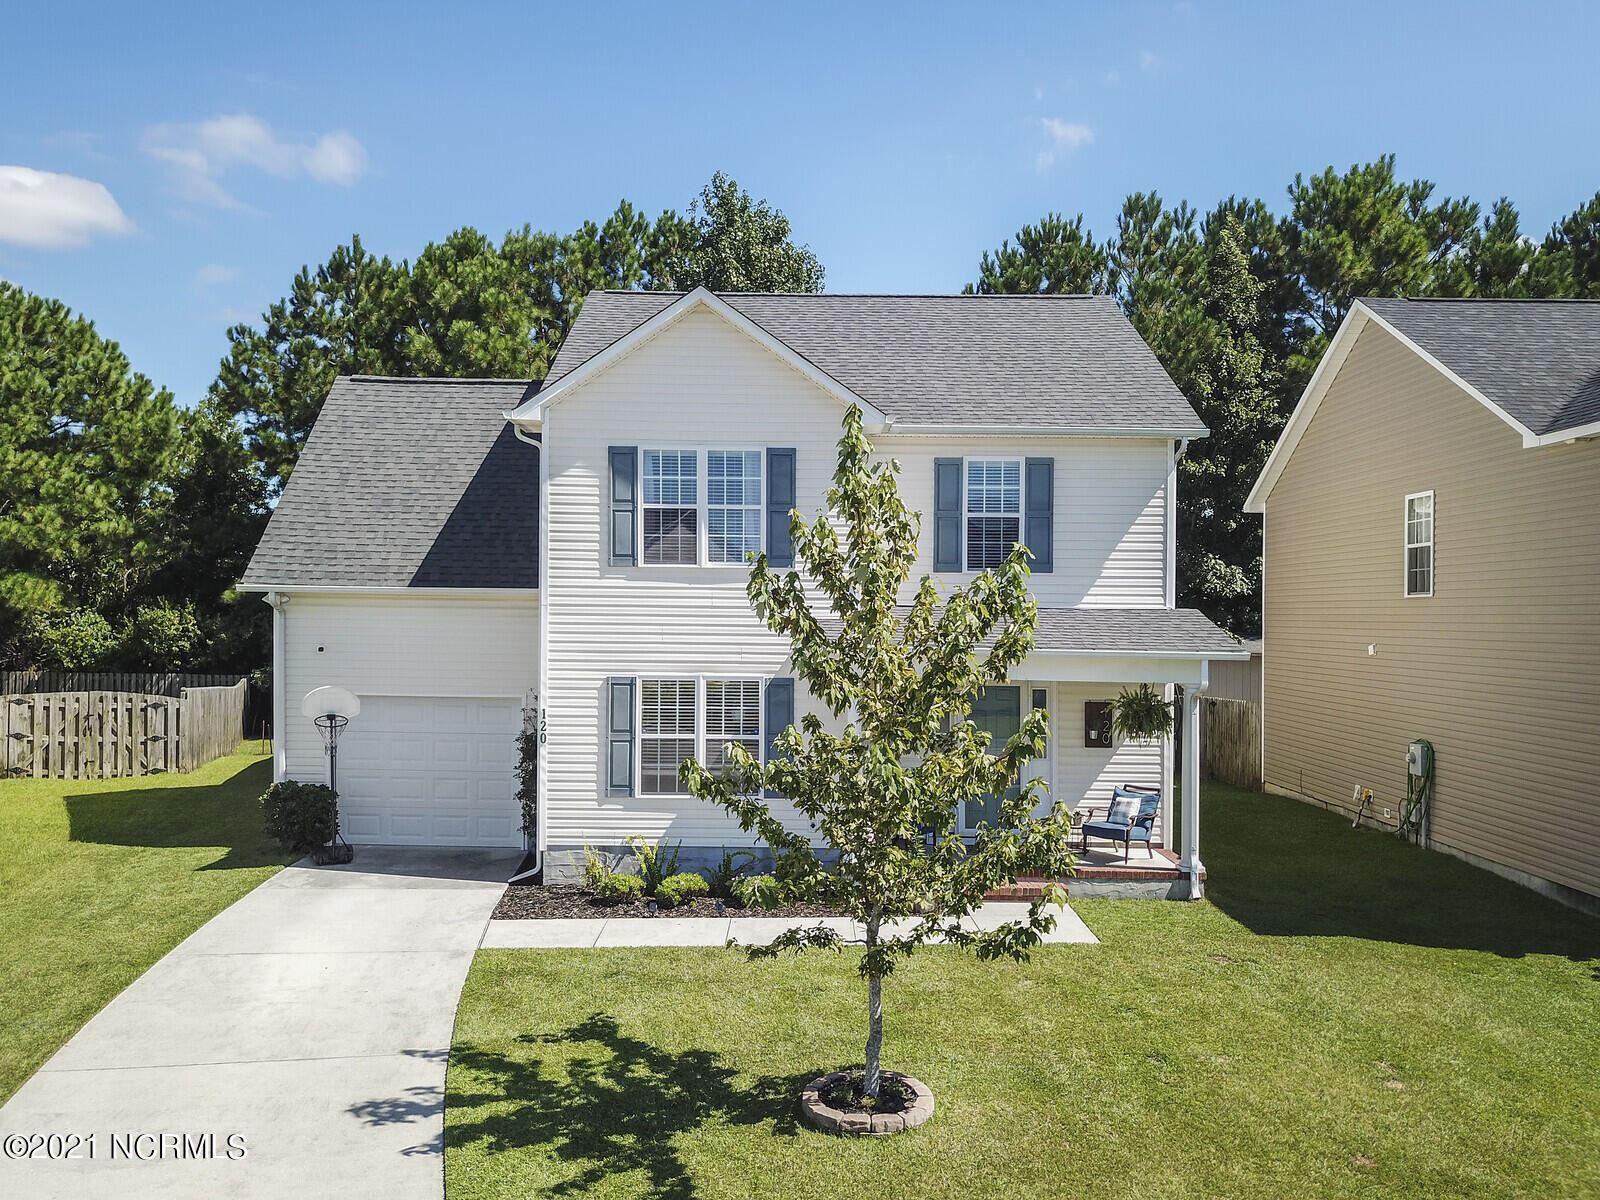 Photo of 120 Durbin Lane, Jacksonville, NC 28546 (MLS # 100292559)